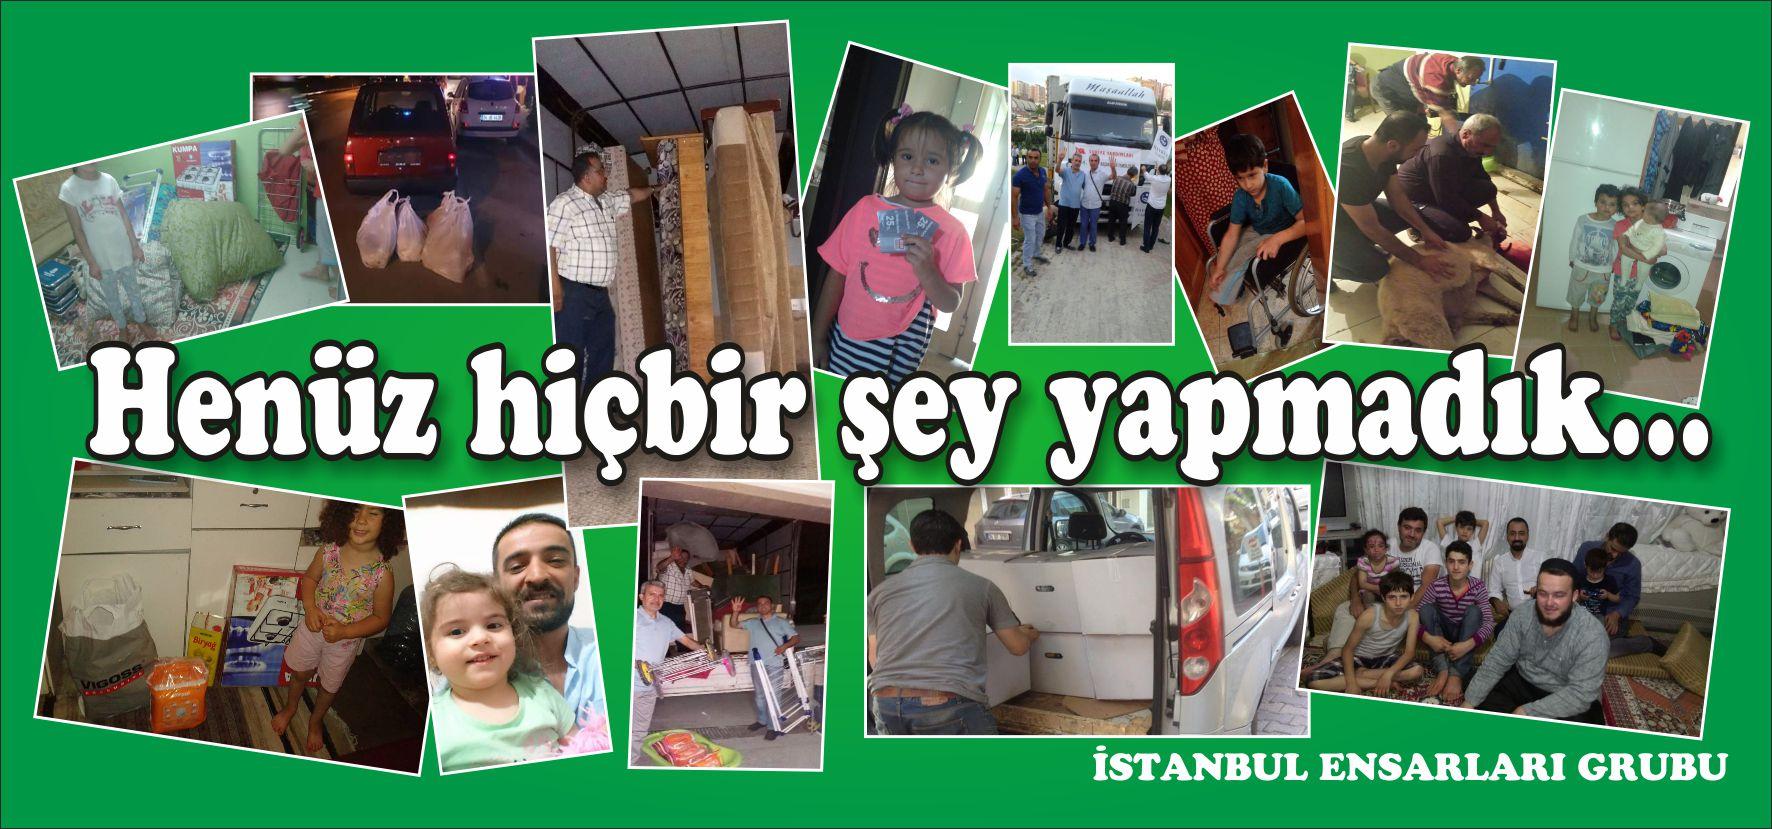 istanbul_ensarlari-(16).jpg